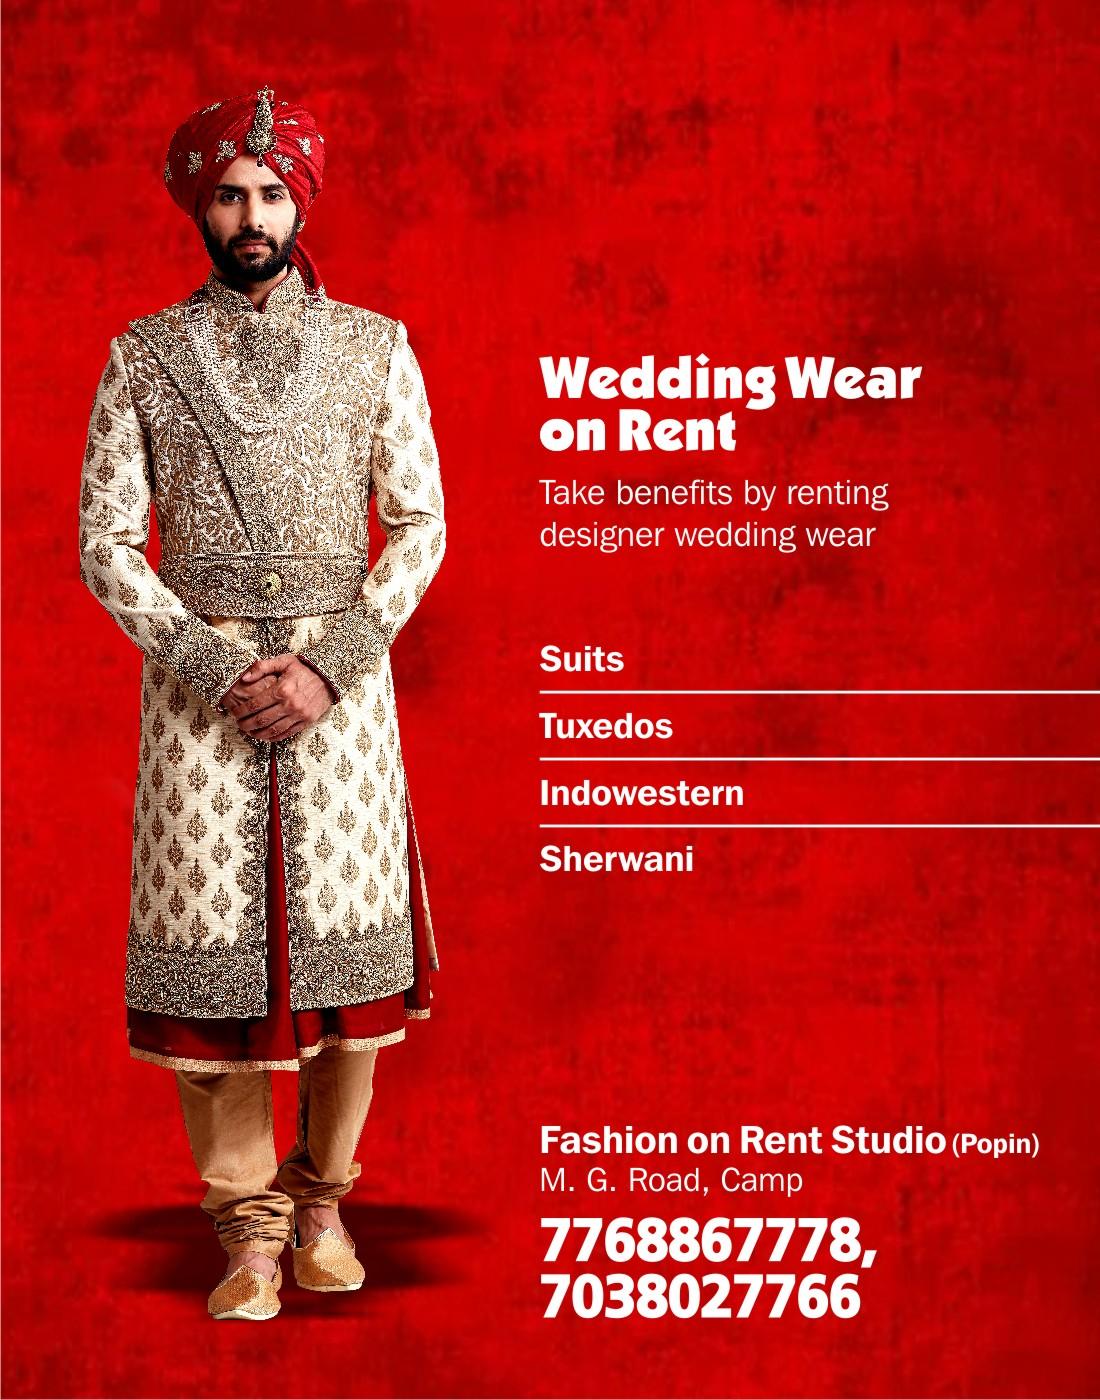 Popin Fashion On Rent in Camp, Pune-411001   Sulekha Pune